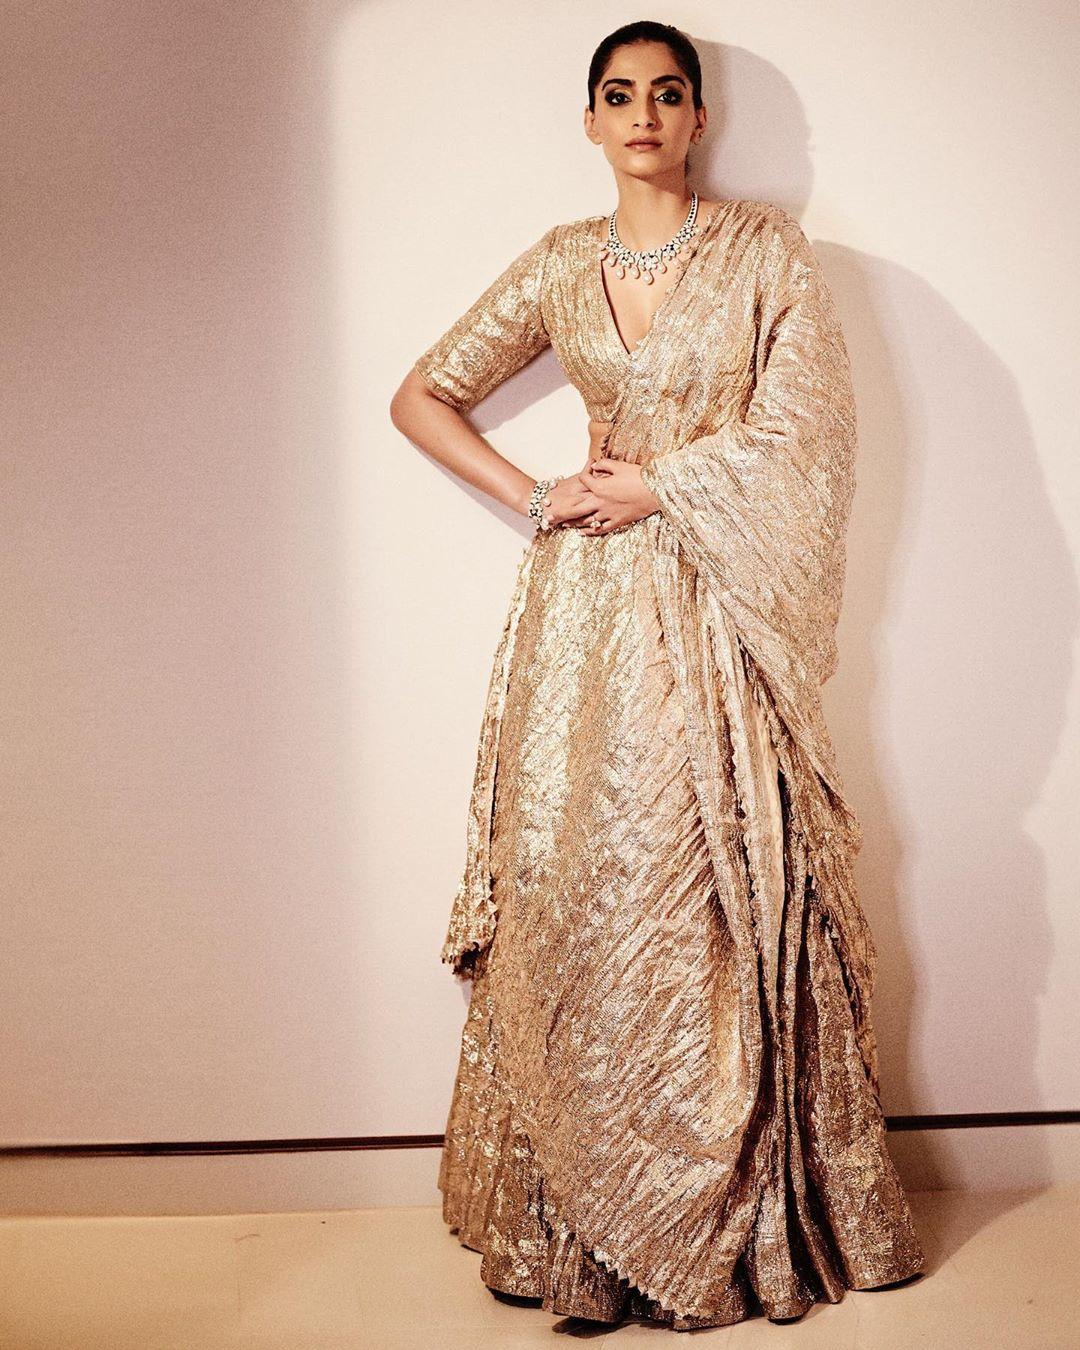 Sonam Kapoor outfits, lehenga